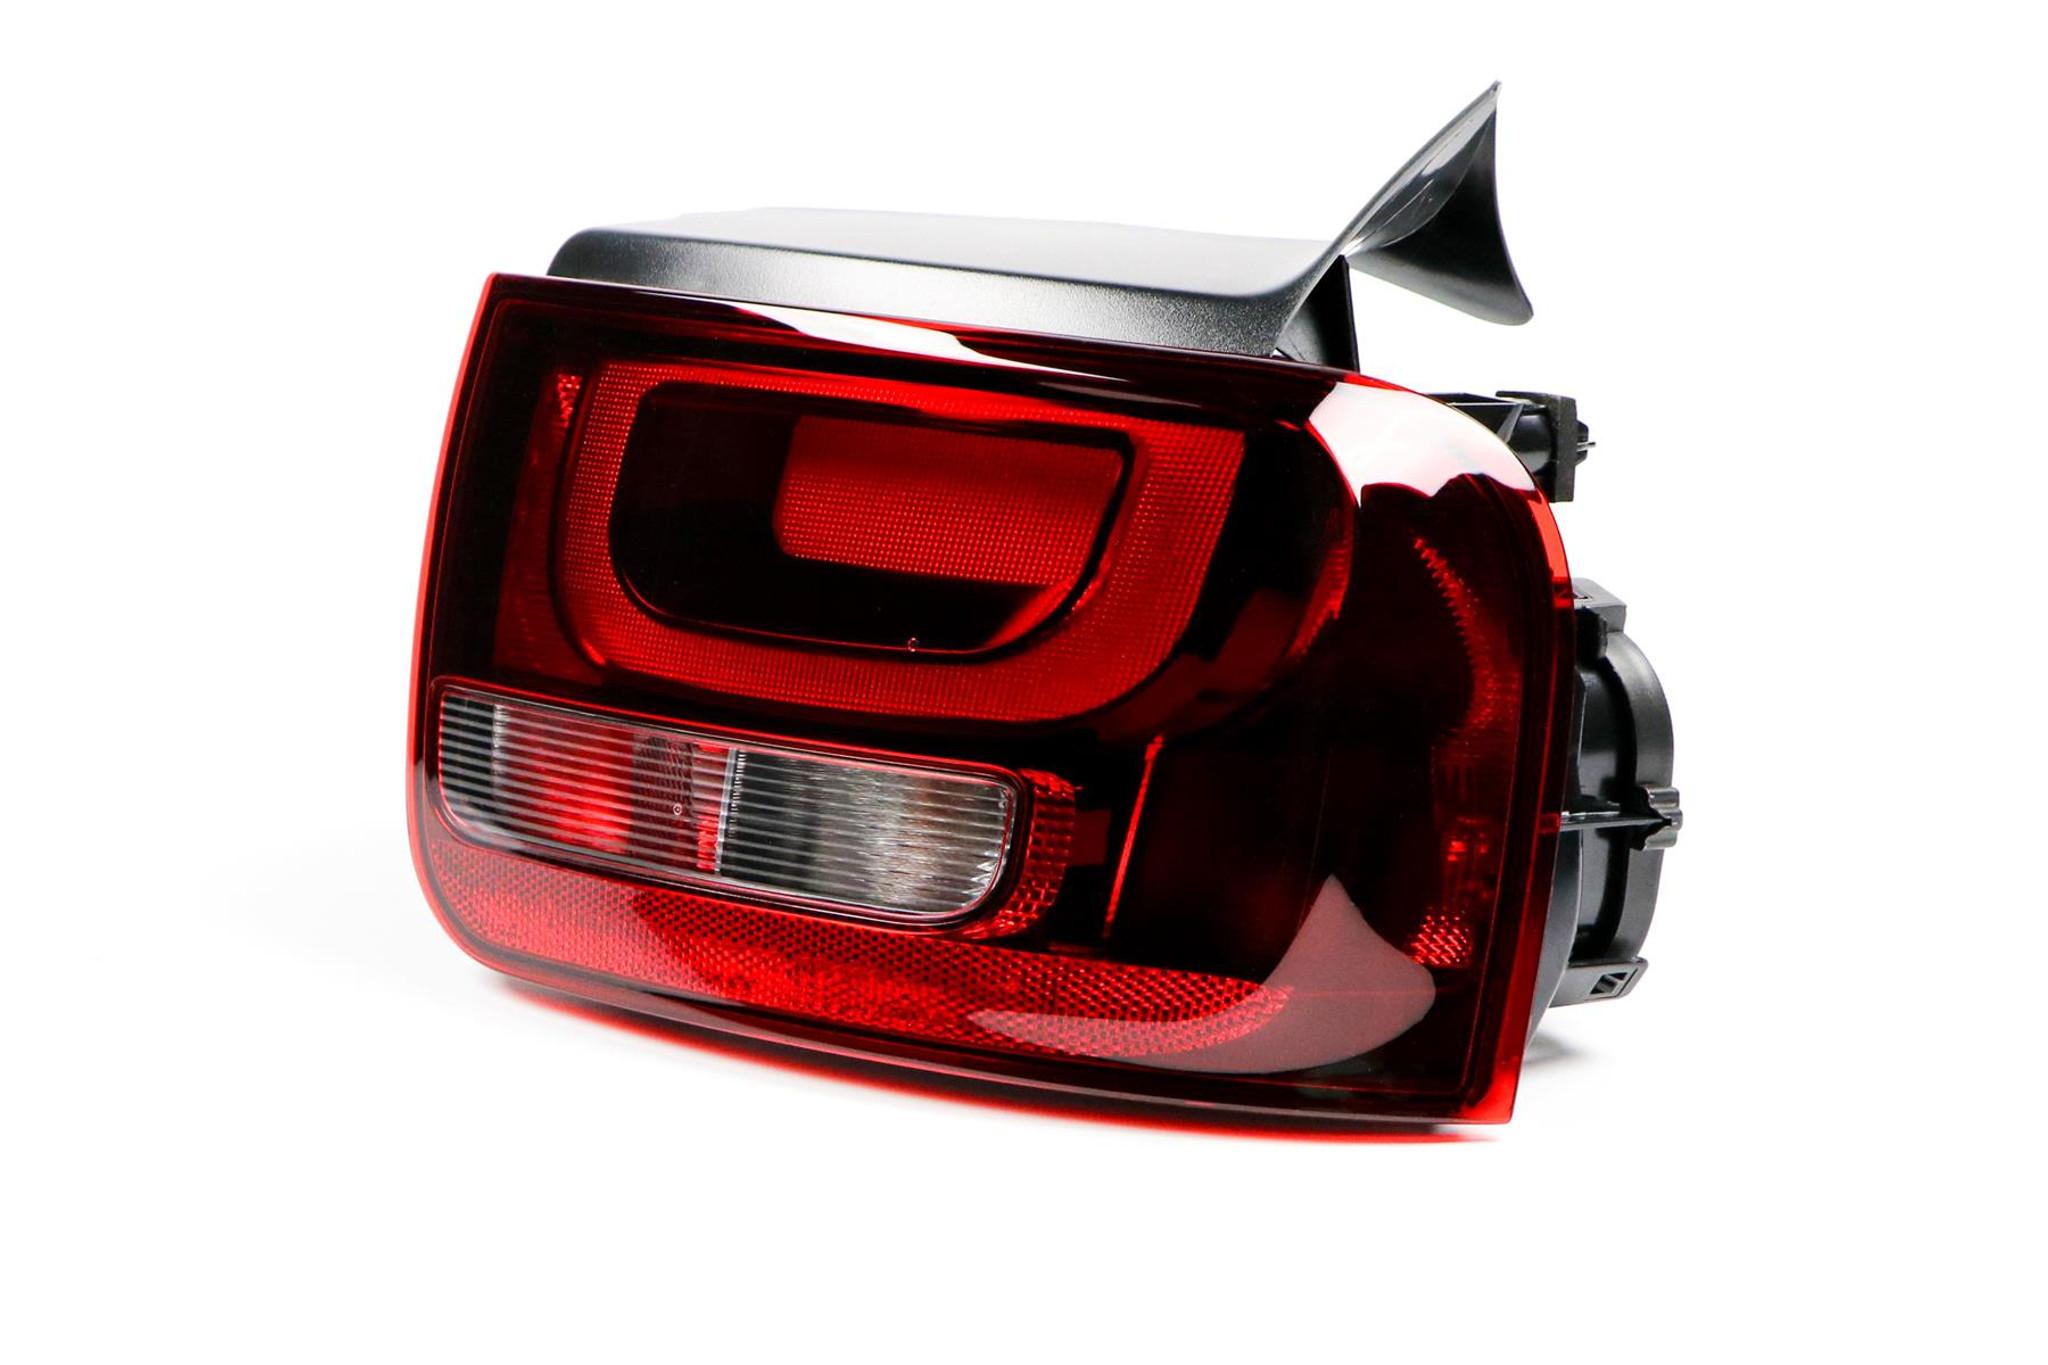 Citroen C4 Cactus 14-17 Rear Tail Light Lamp Right Driver Off Side O//S OEM Valeo